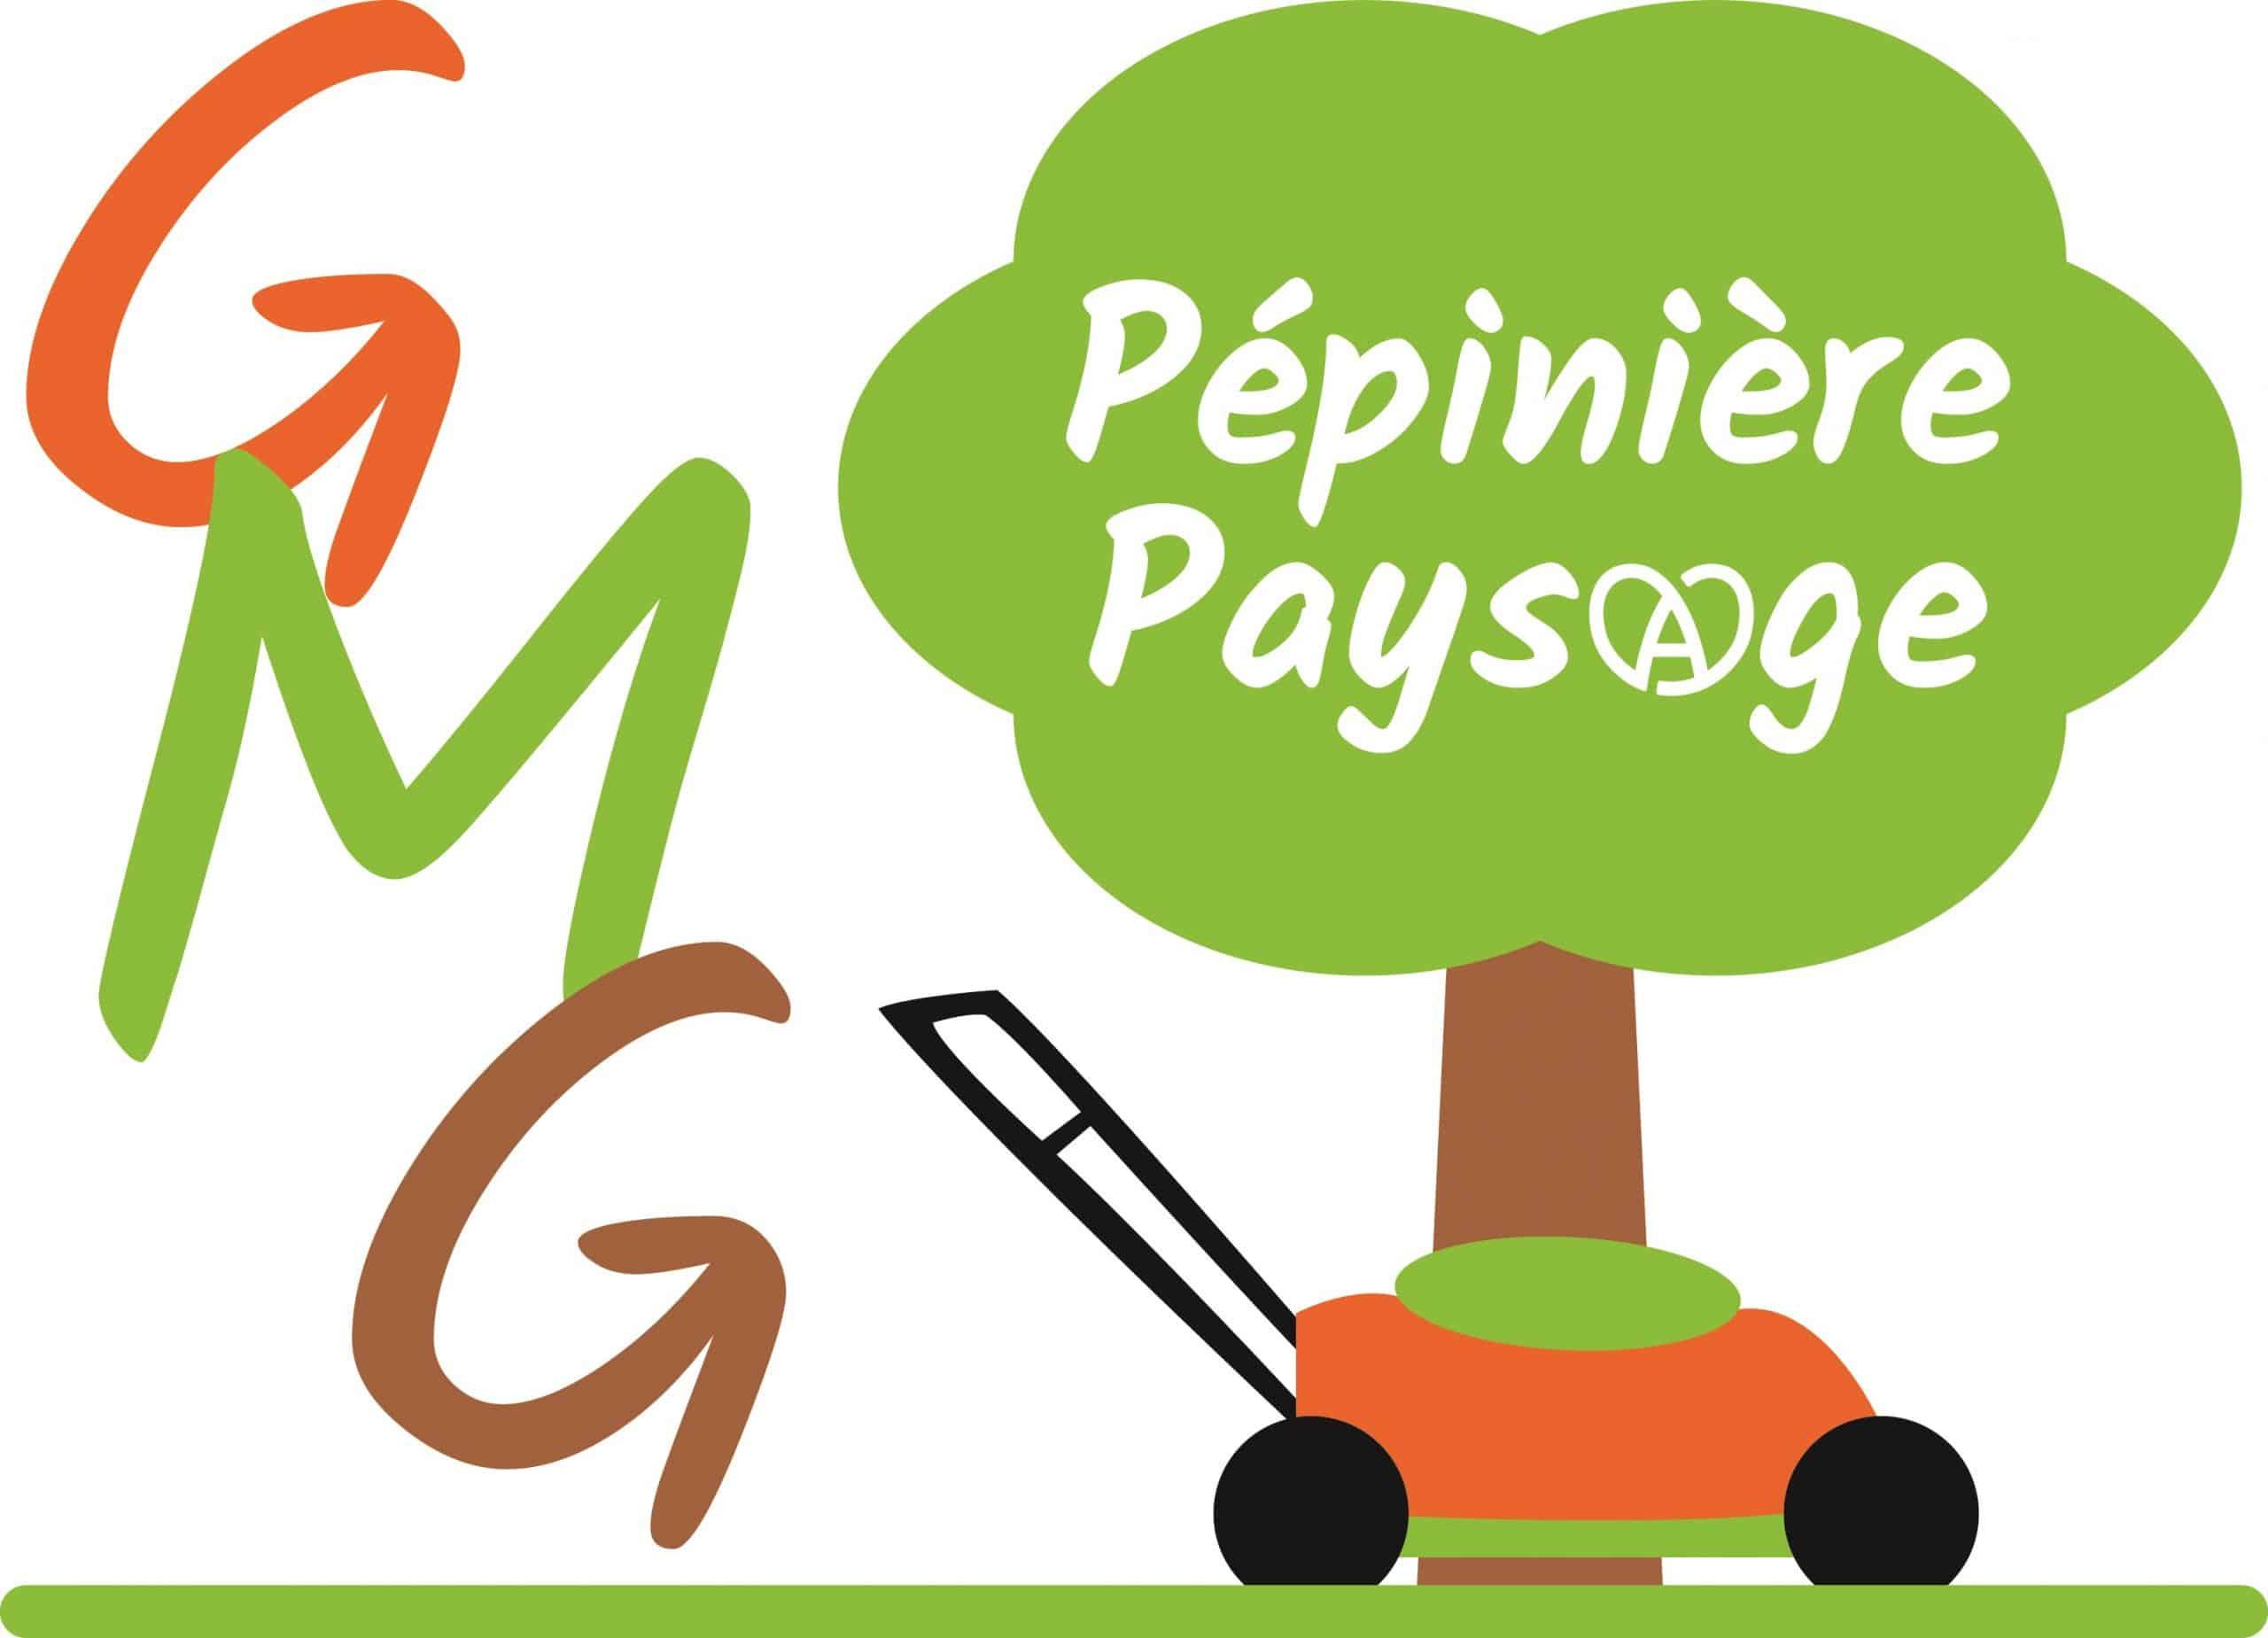 Logo GMG PEPINIERE PAYSAGE